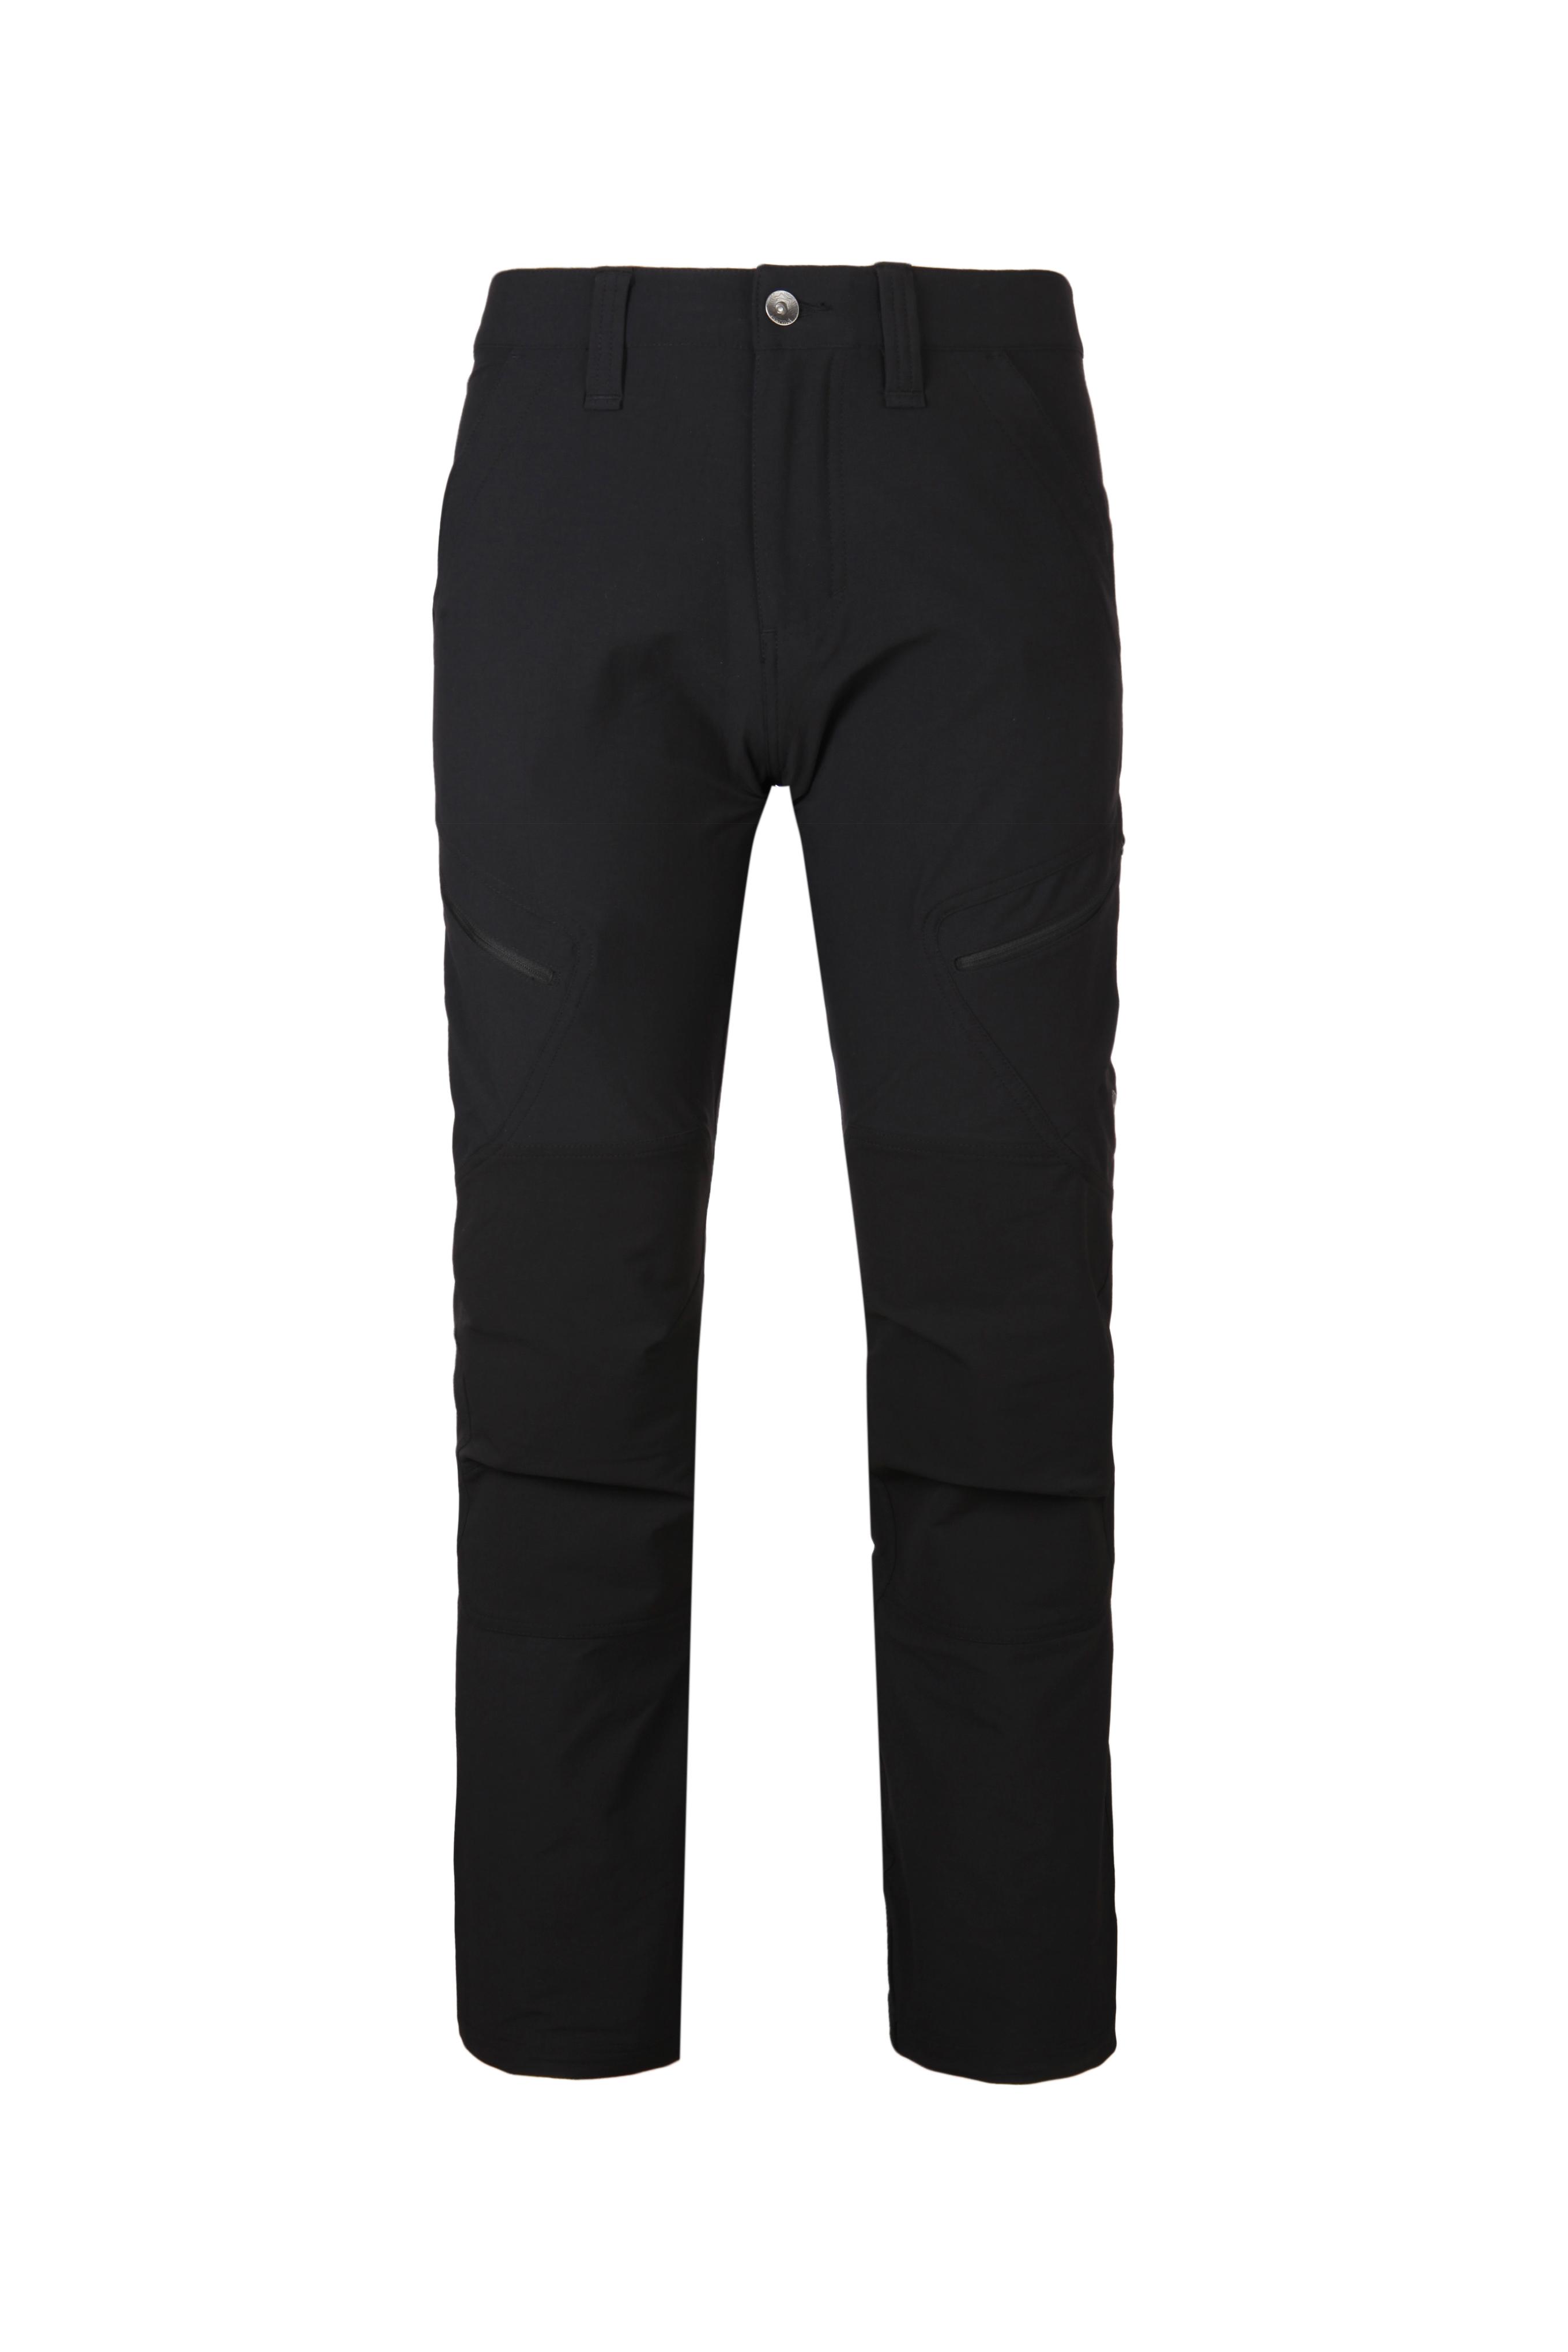 Highland Pant软壳裤